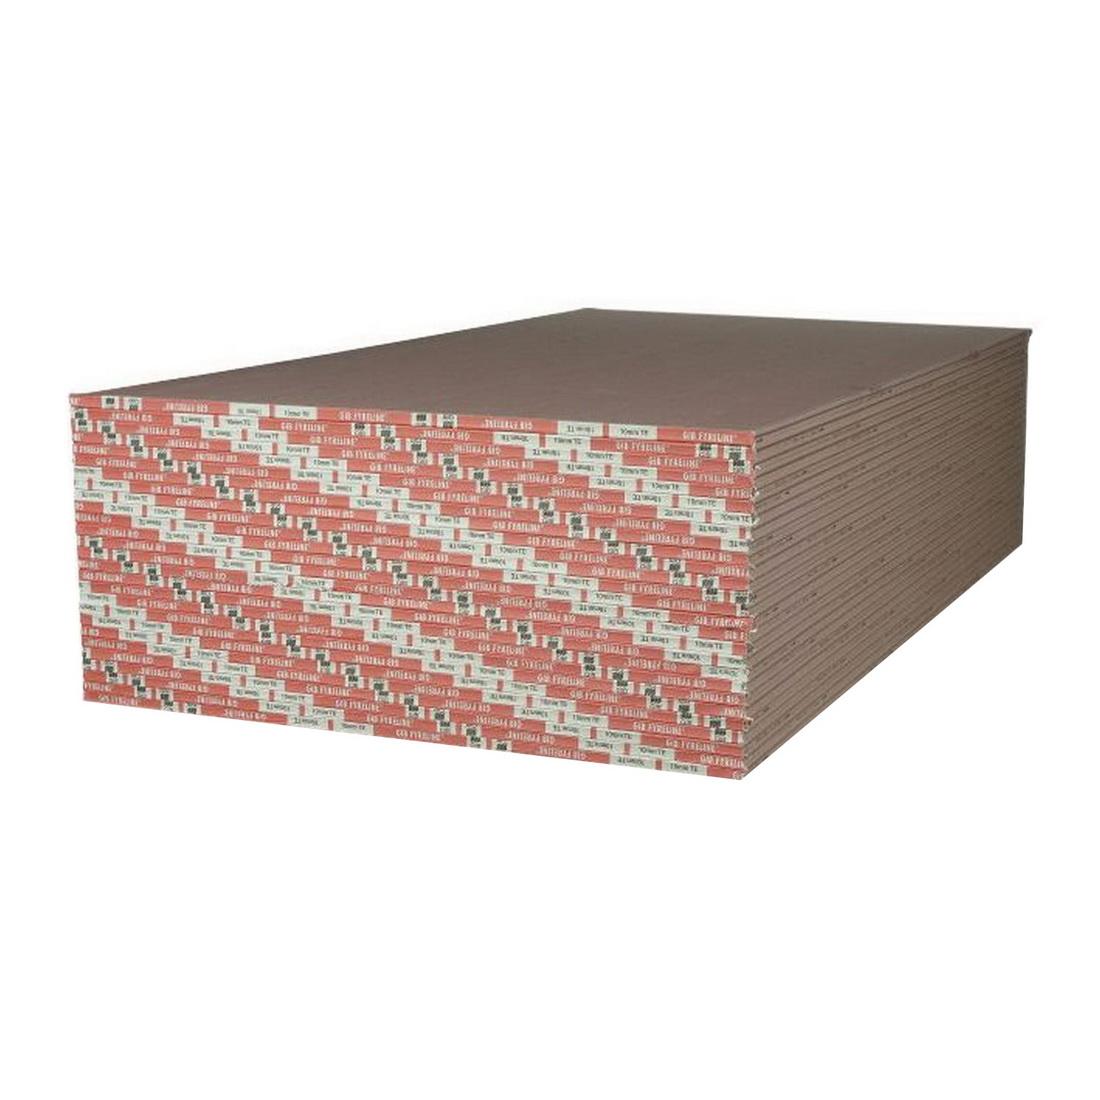 Fyreline Plasterboard 3000 x 1200 x 19mm 11575